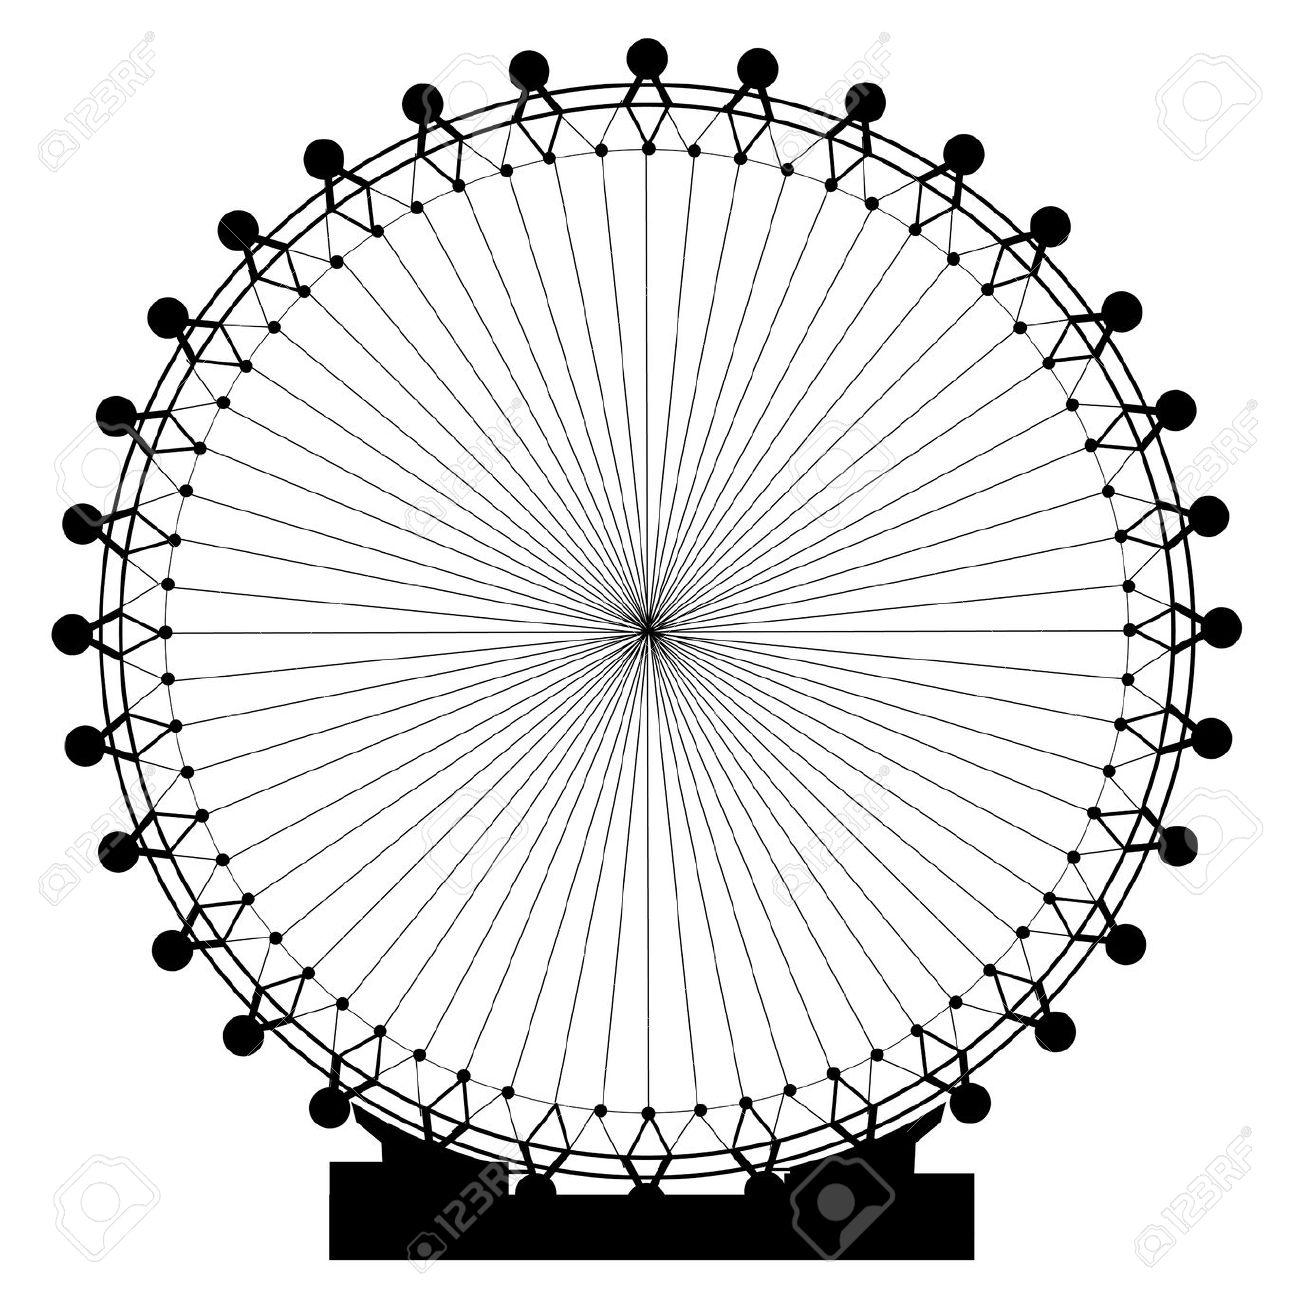 London Eye clipart London Eye Drawing #10